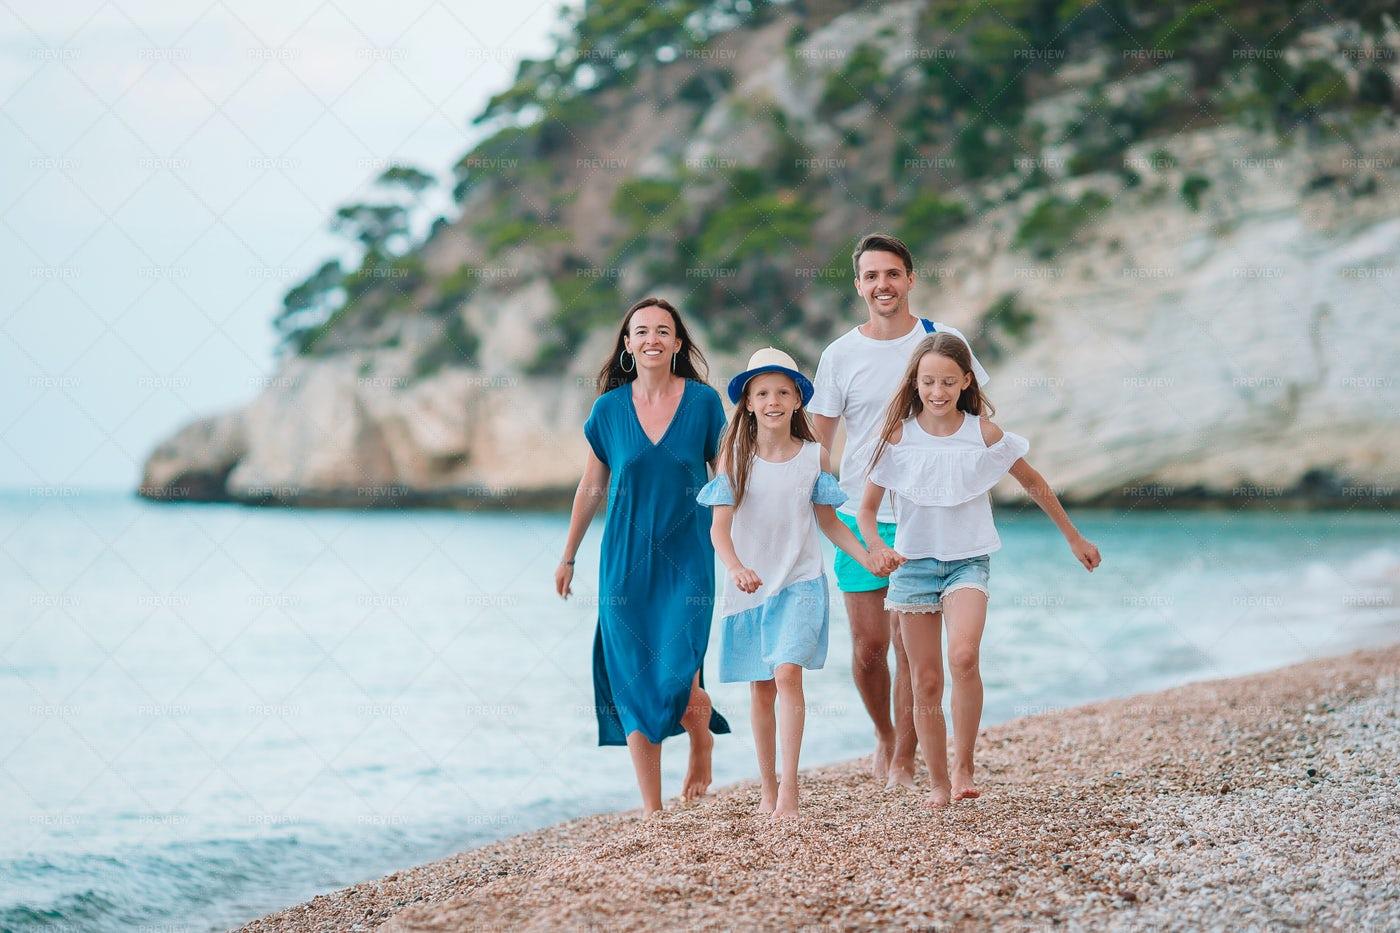 Family On Beach Pebbles: Stock Photos